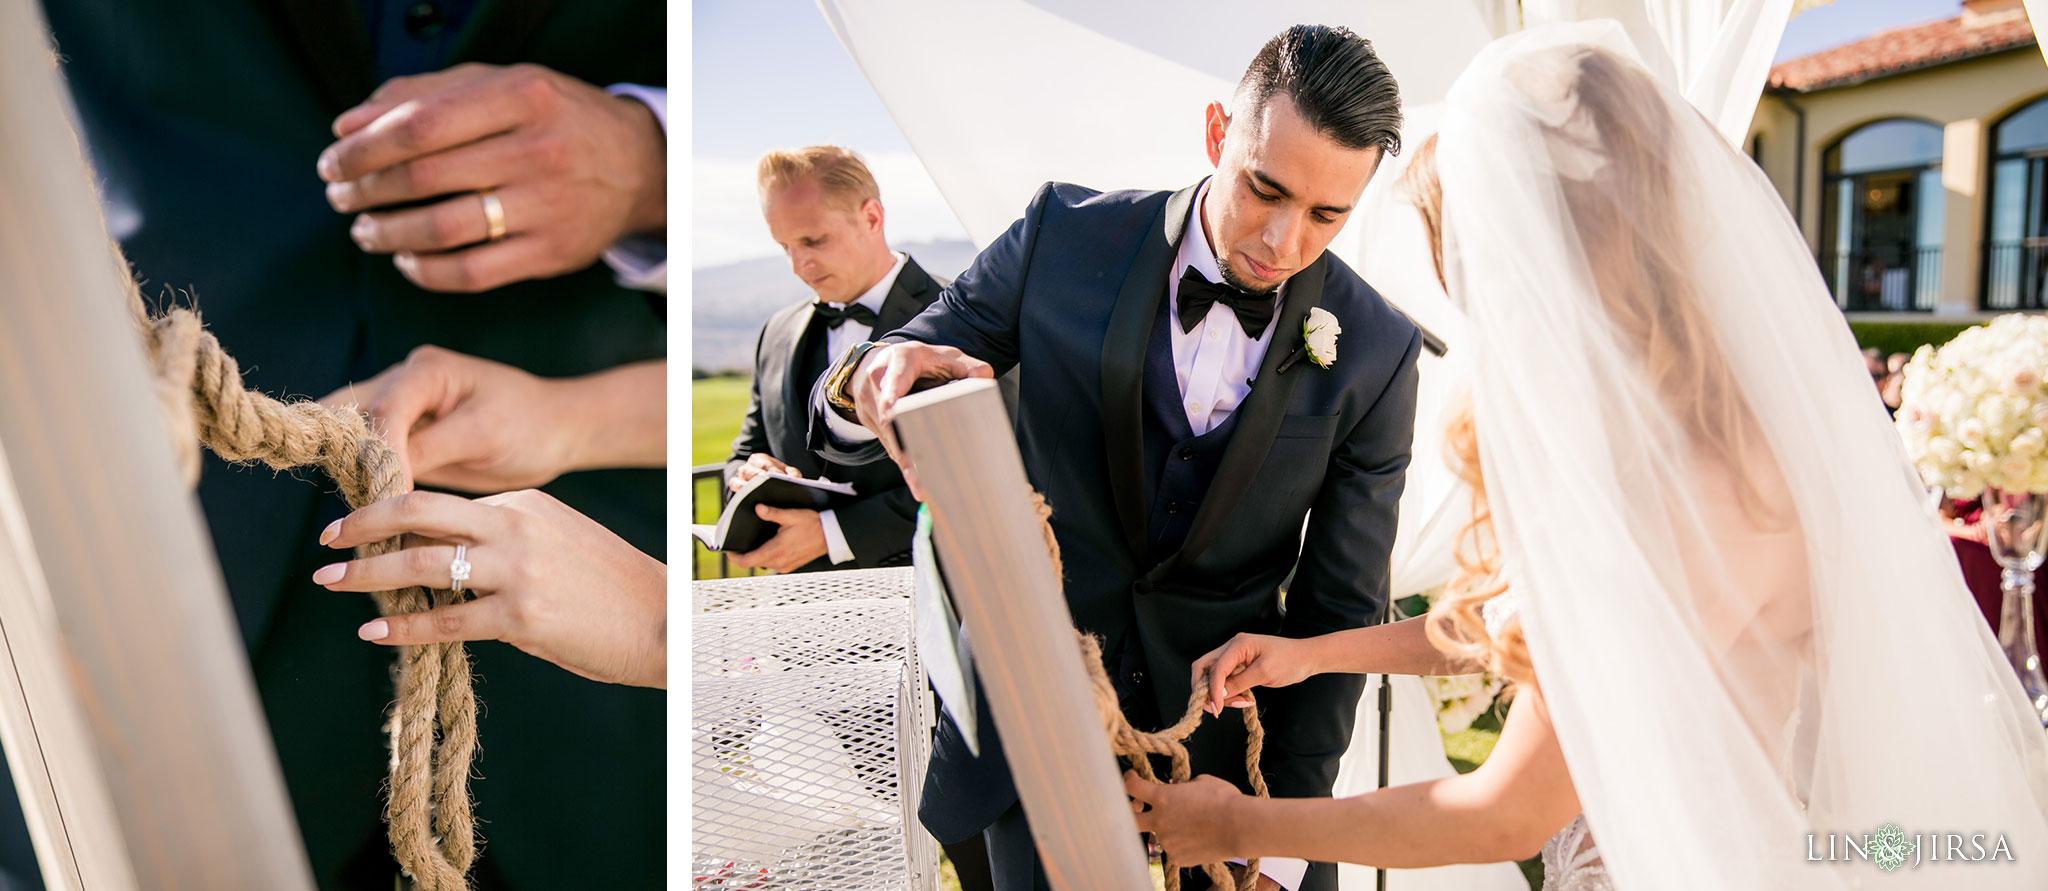 16 trump national golf course palos verdes wedding ceremony photography